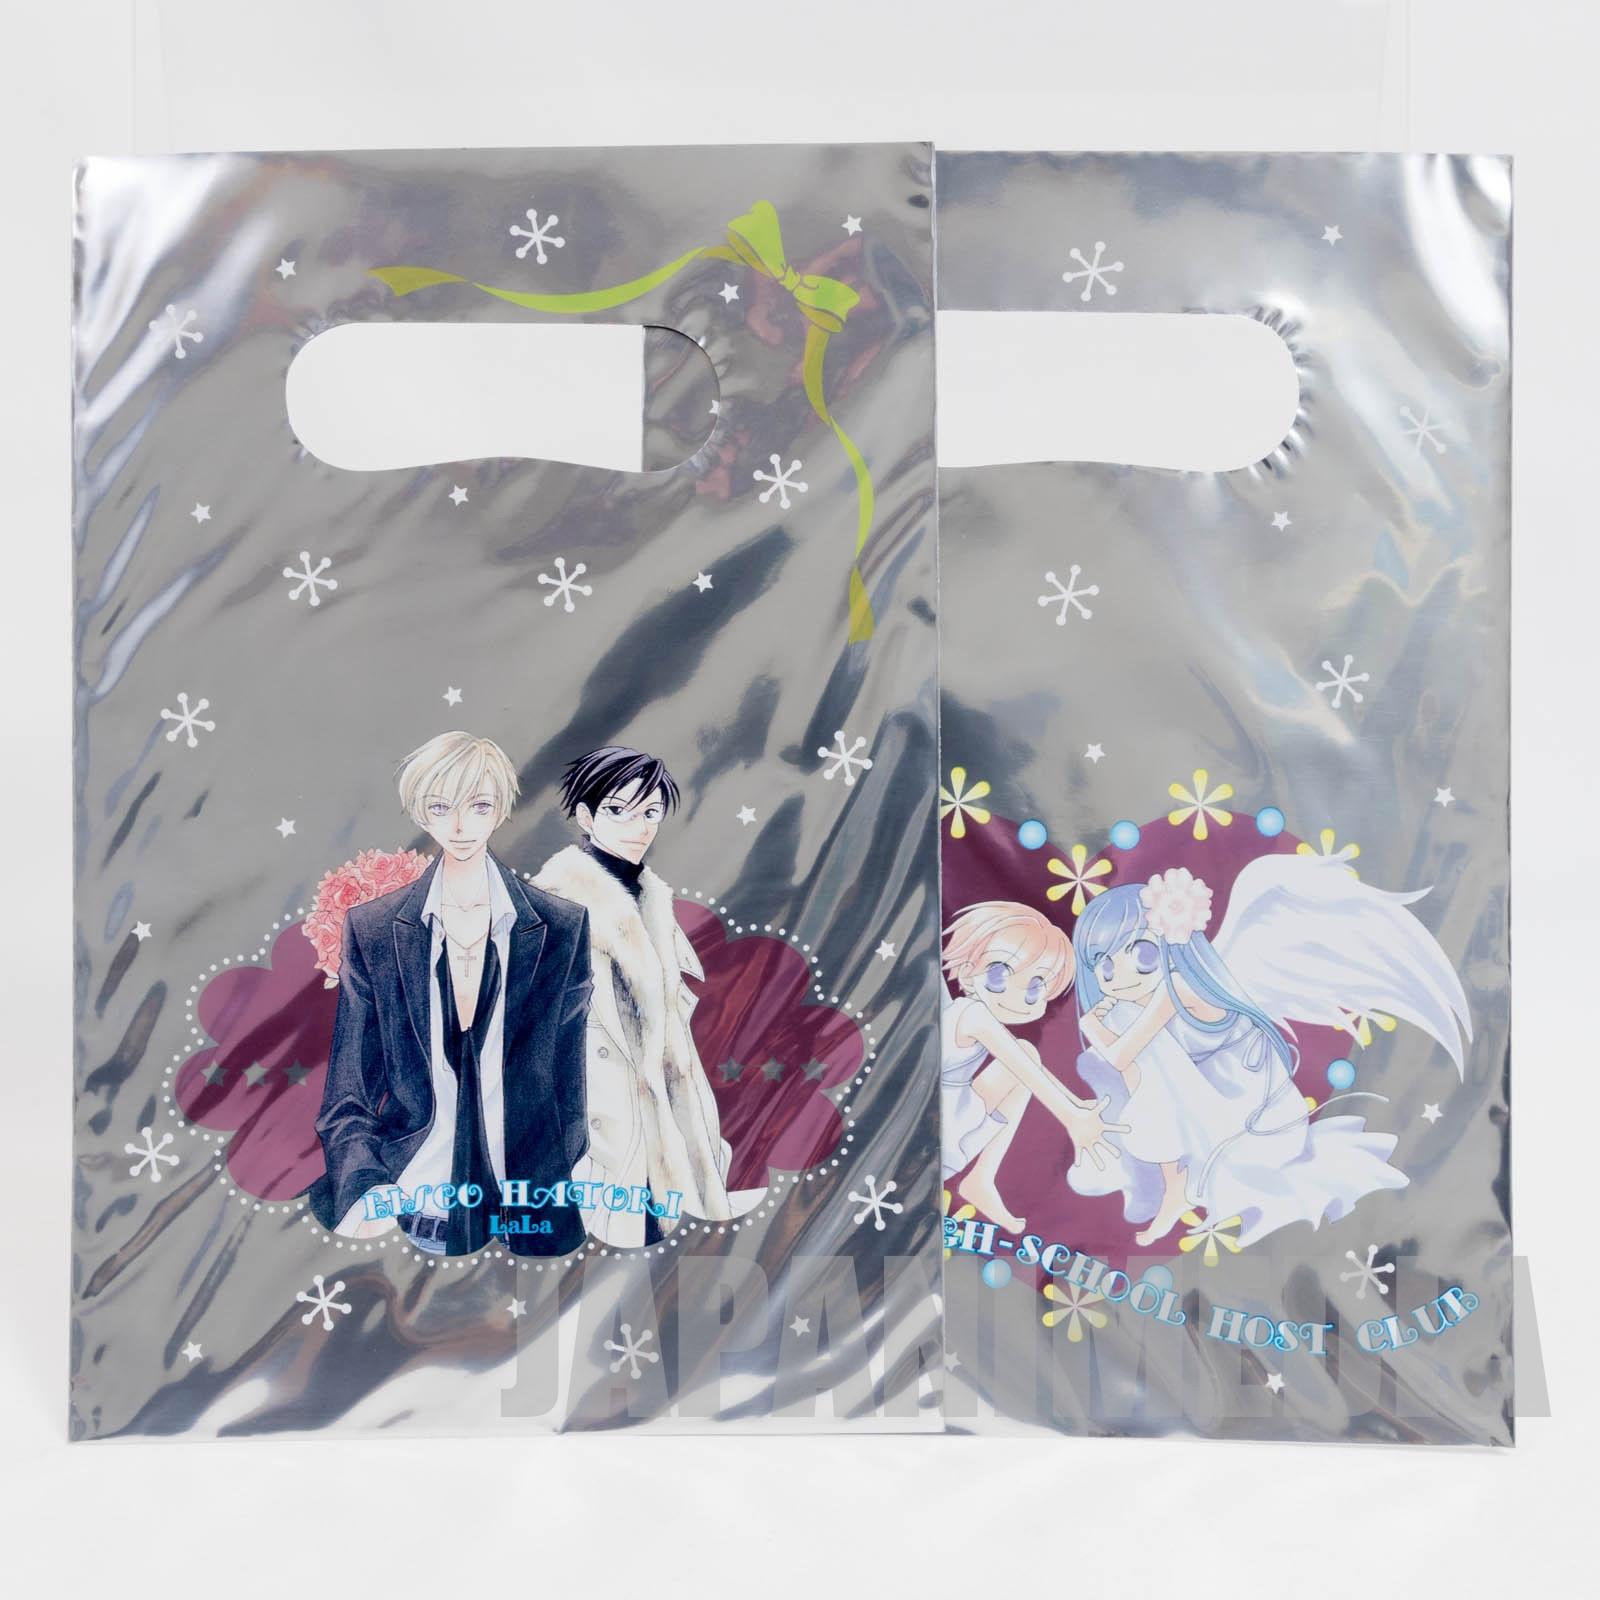 Ouran High School Host Club Kira Kira Vinyl Gift bag 2pc set JAPAN MANGA